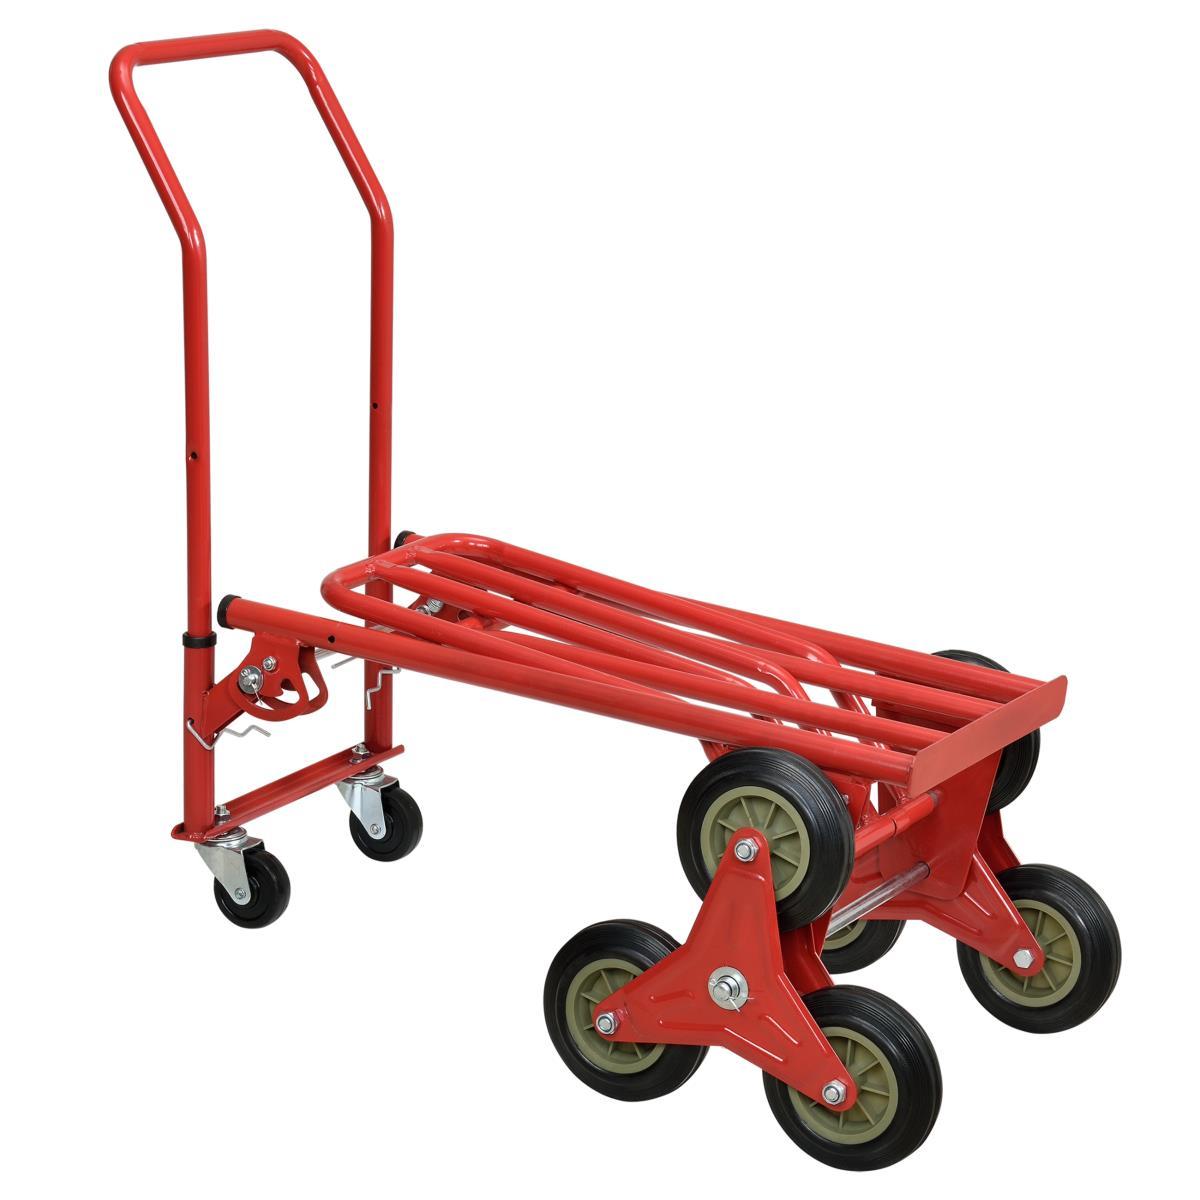 diable transport dans escalier transformable en chariot. Black Bedroom Furniture Sets. Home Design Ideas